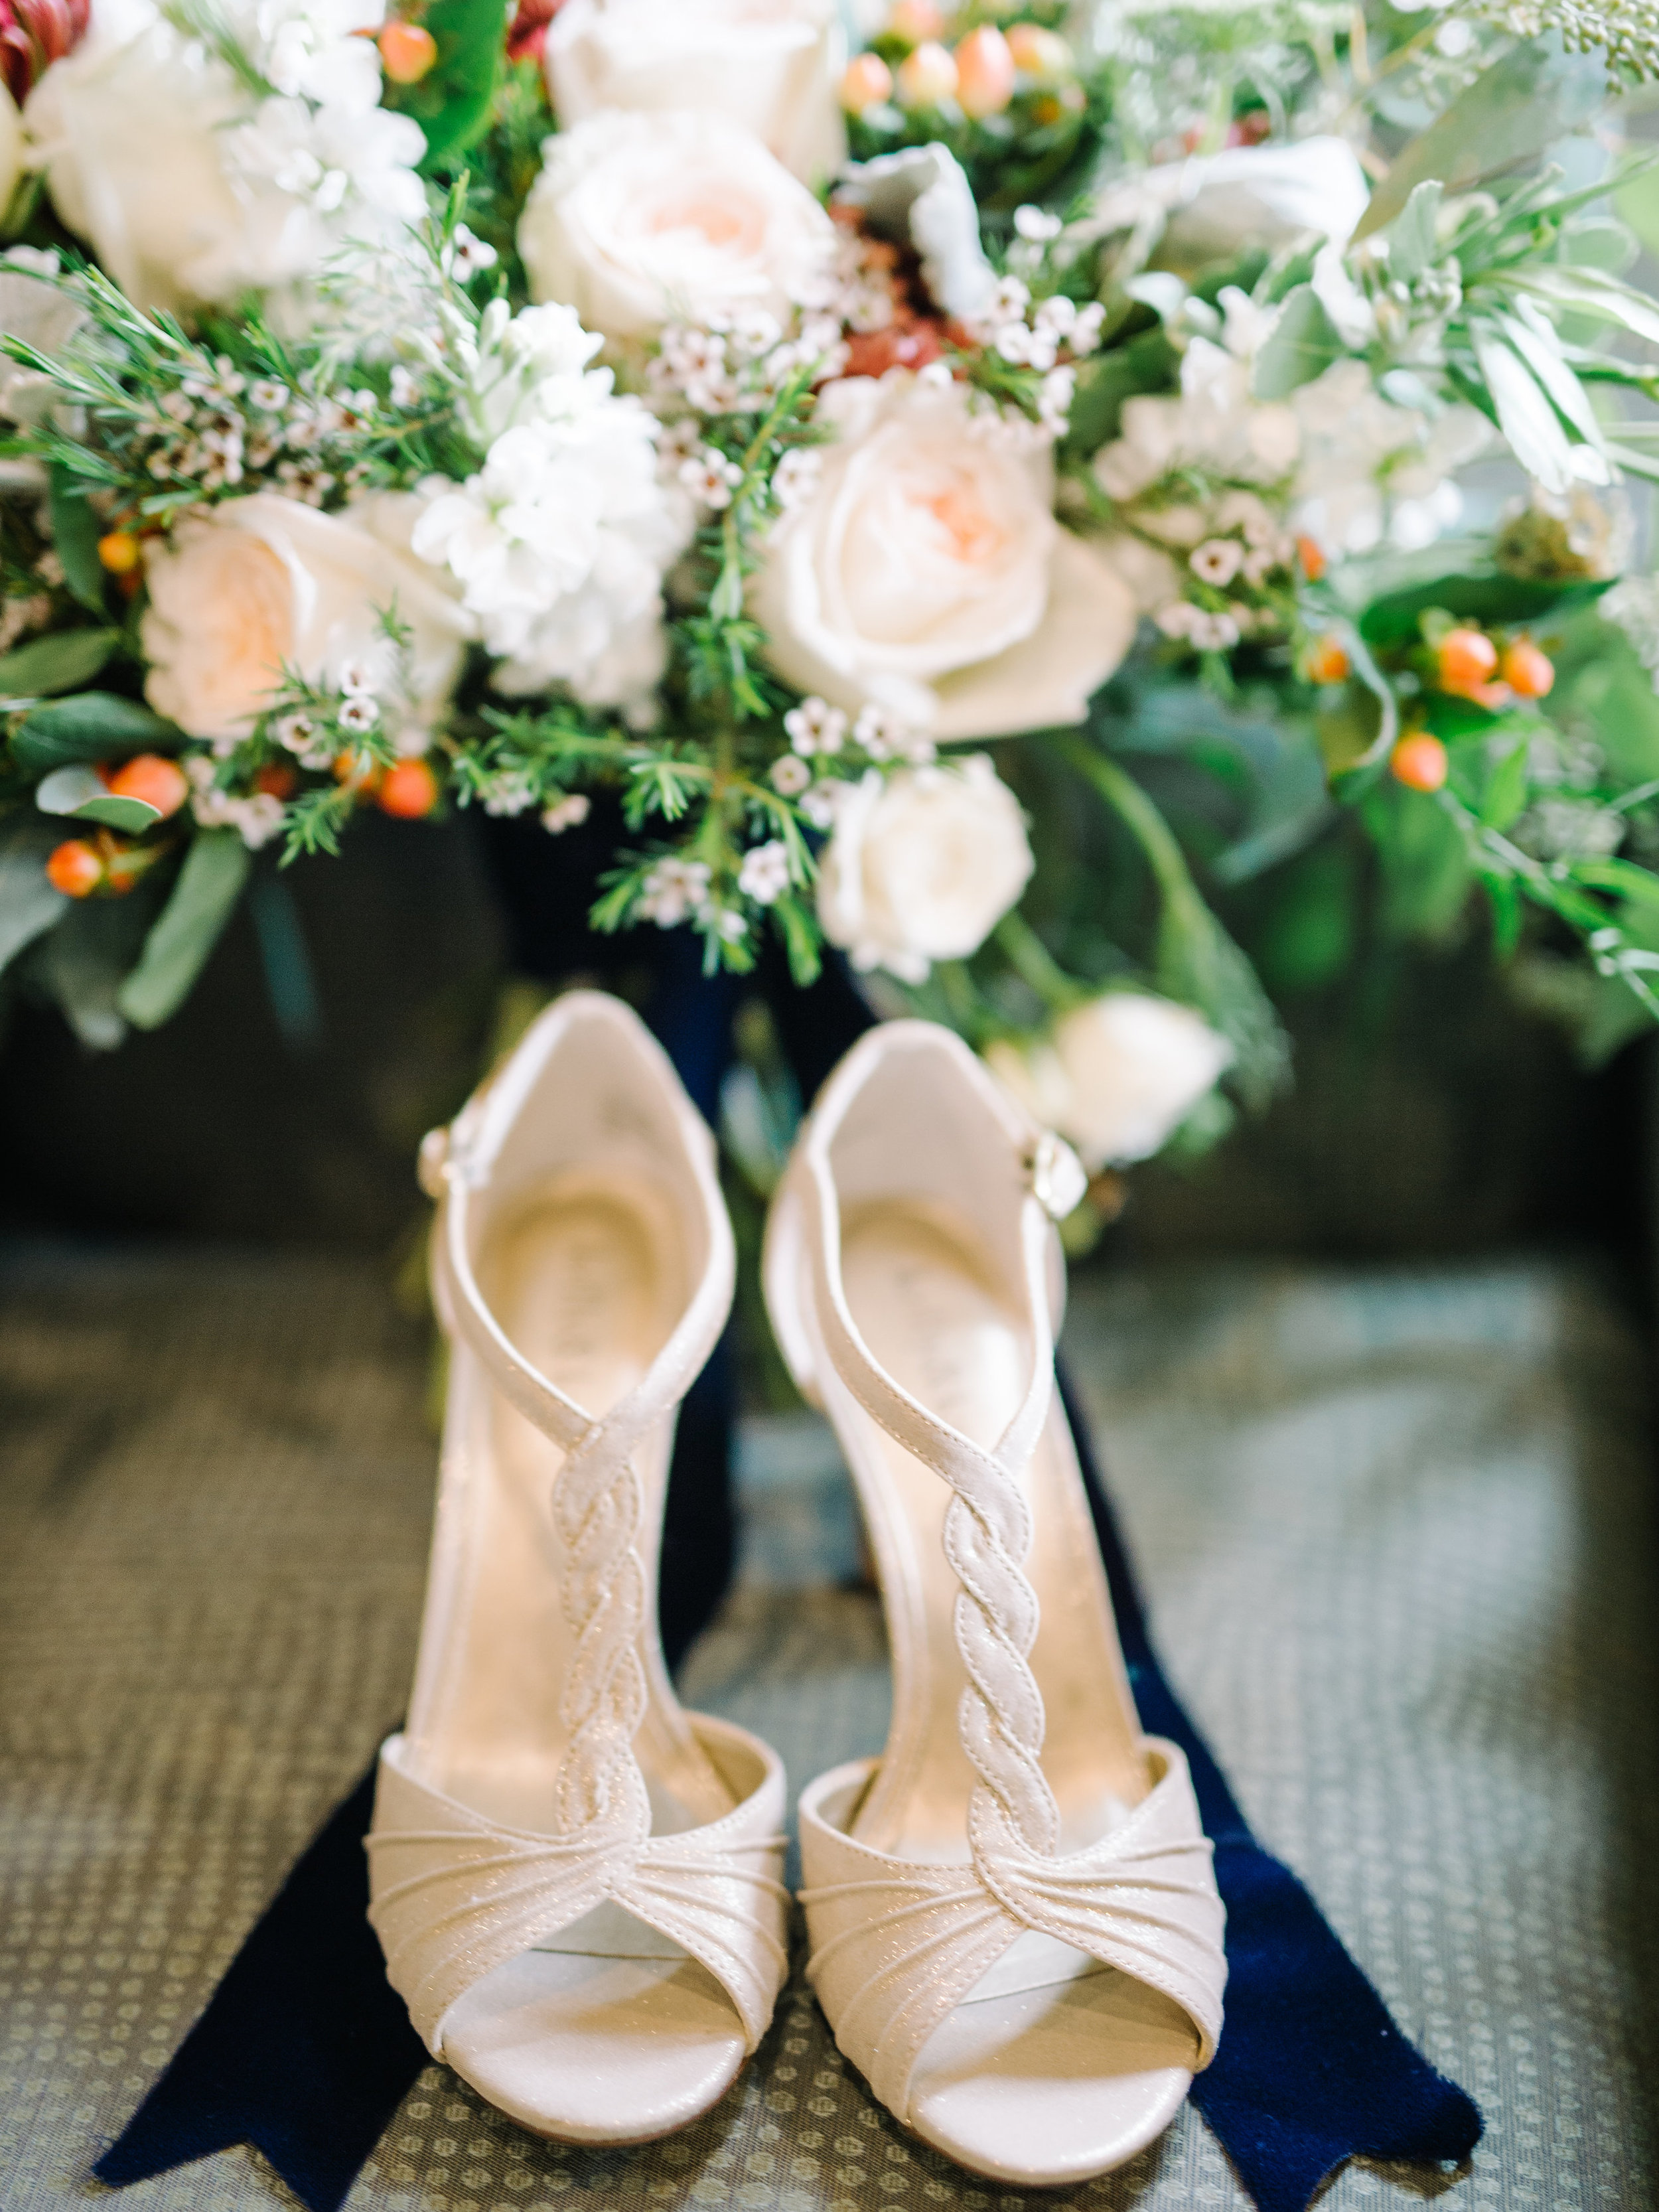 amber-and-paul-rach-loves-troy-charles-h-morris-center-wedding-sarah-seven-helene-lace-wedding-dress-ivory-and-beau-bridal-boutique-savannah-wedding-planner-savannah-event-designer-savannah-florist-savannah-weddings-savannah-bridal-boutique-2.jpg